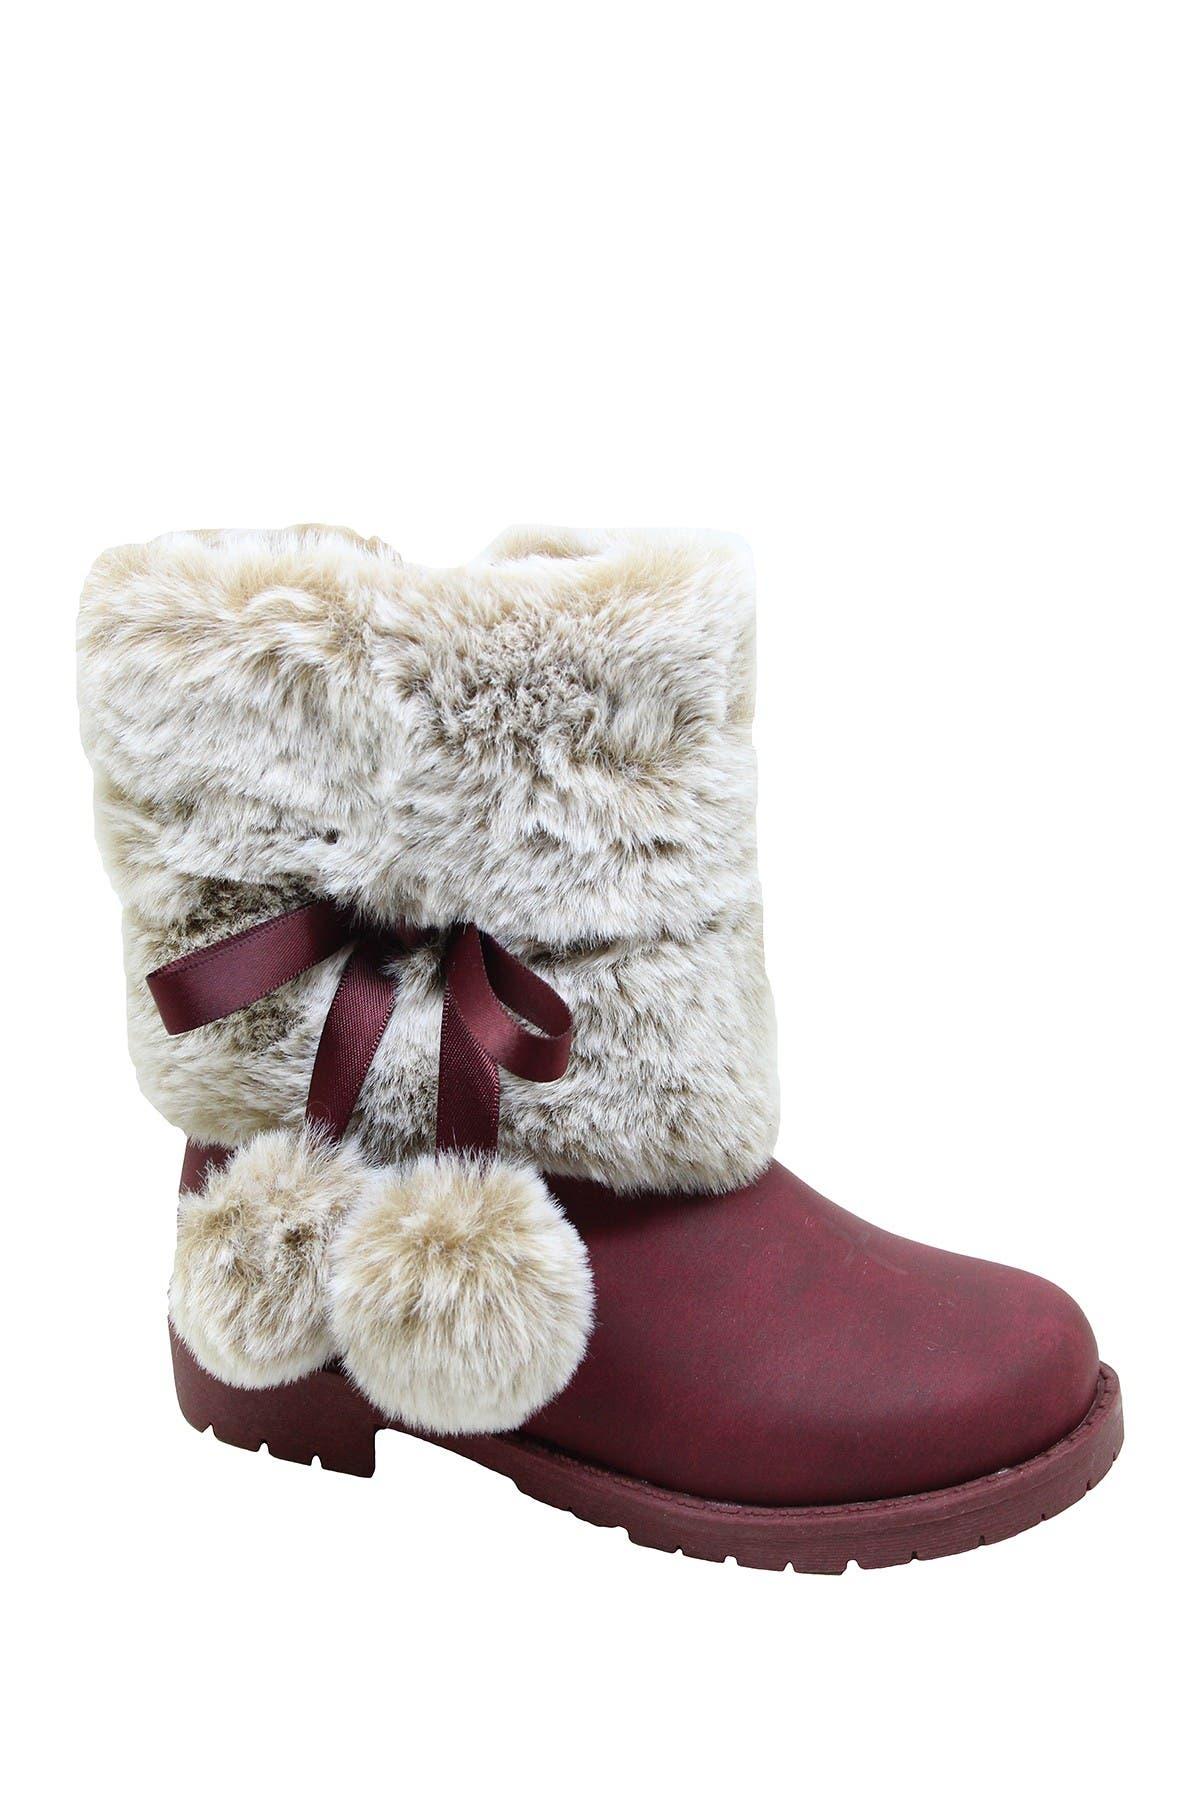 Nicole Miller Faux Fur Trimmed Pompom Boot